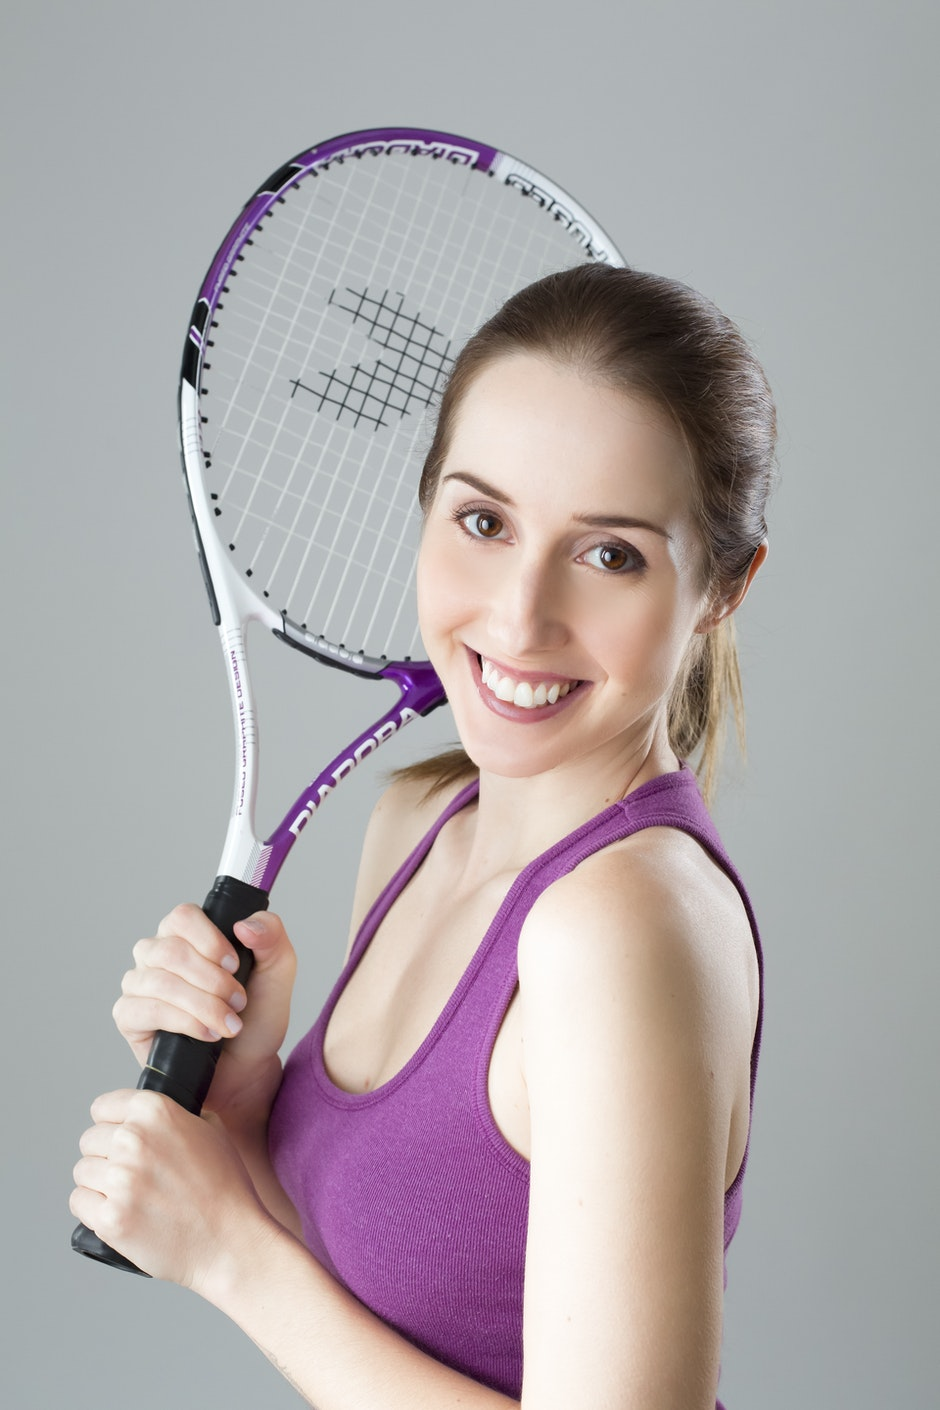 active, adult, athlete